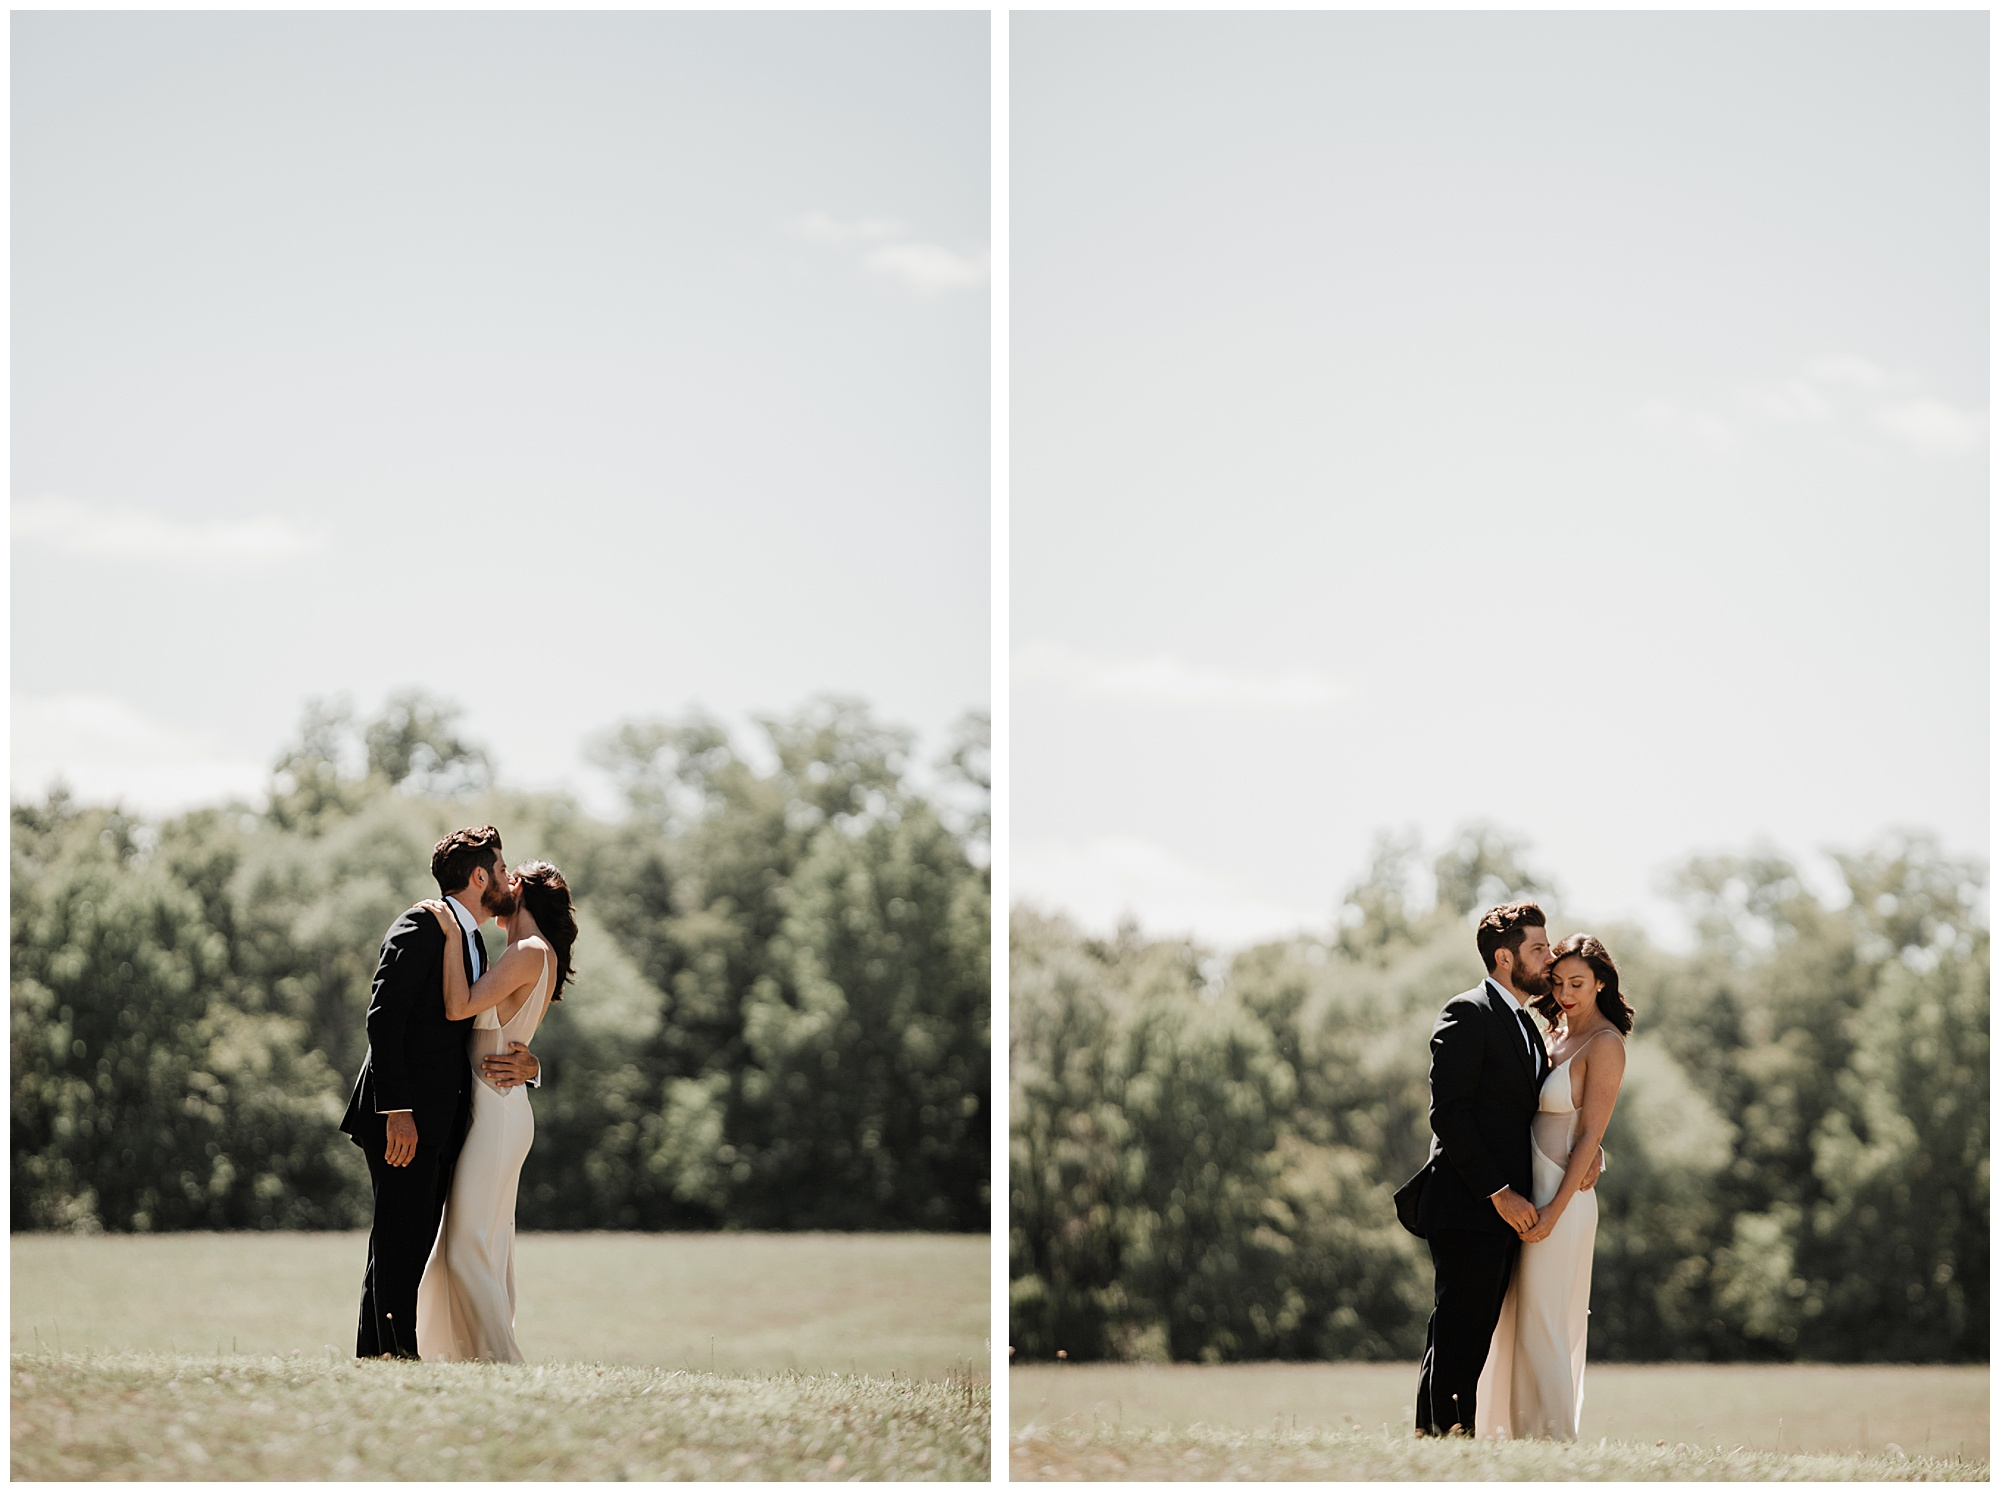 allerton_park_wedding_champaign_il_chicago_wright_photographs_ne_0020.jpg